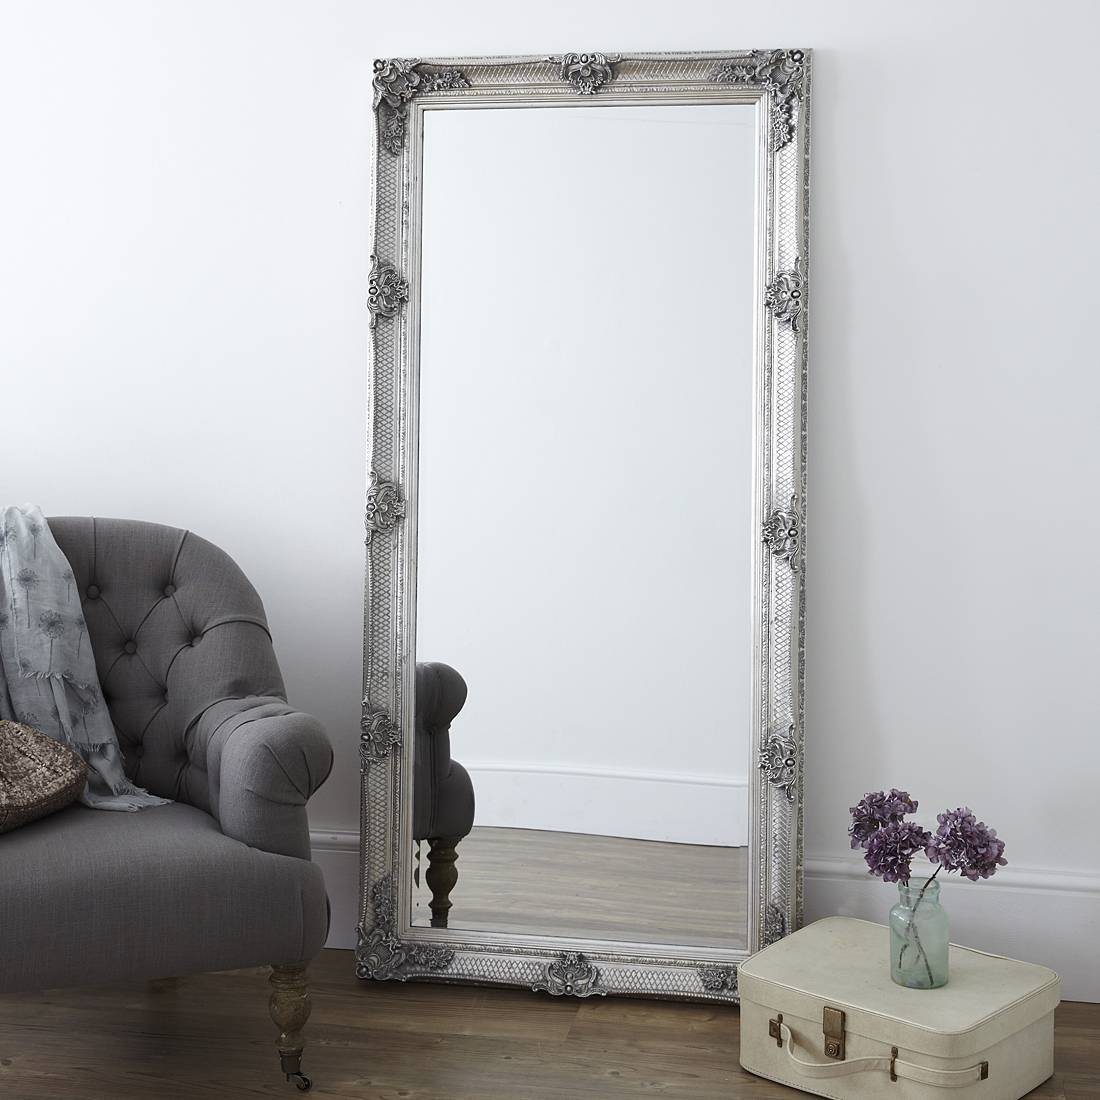 Full floor mirror